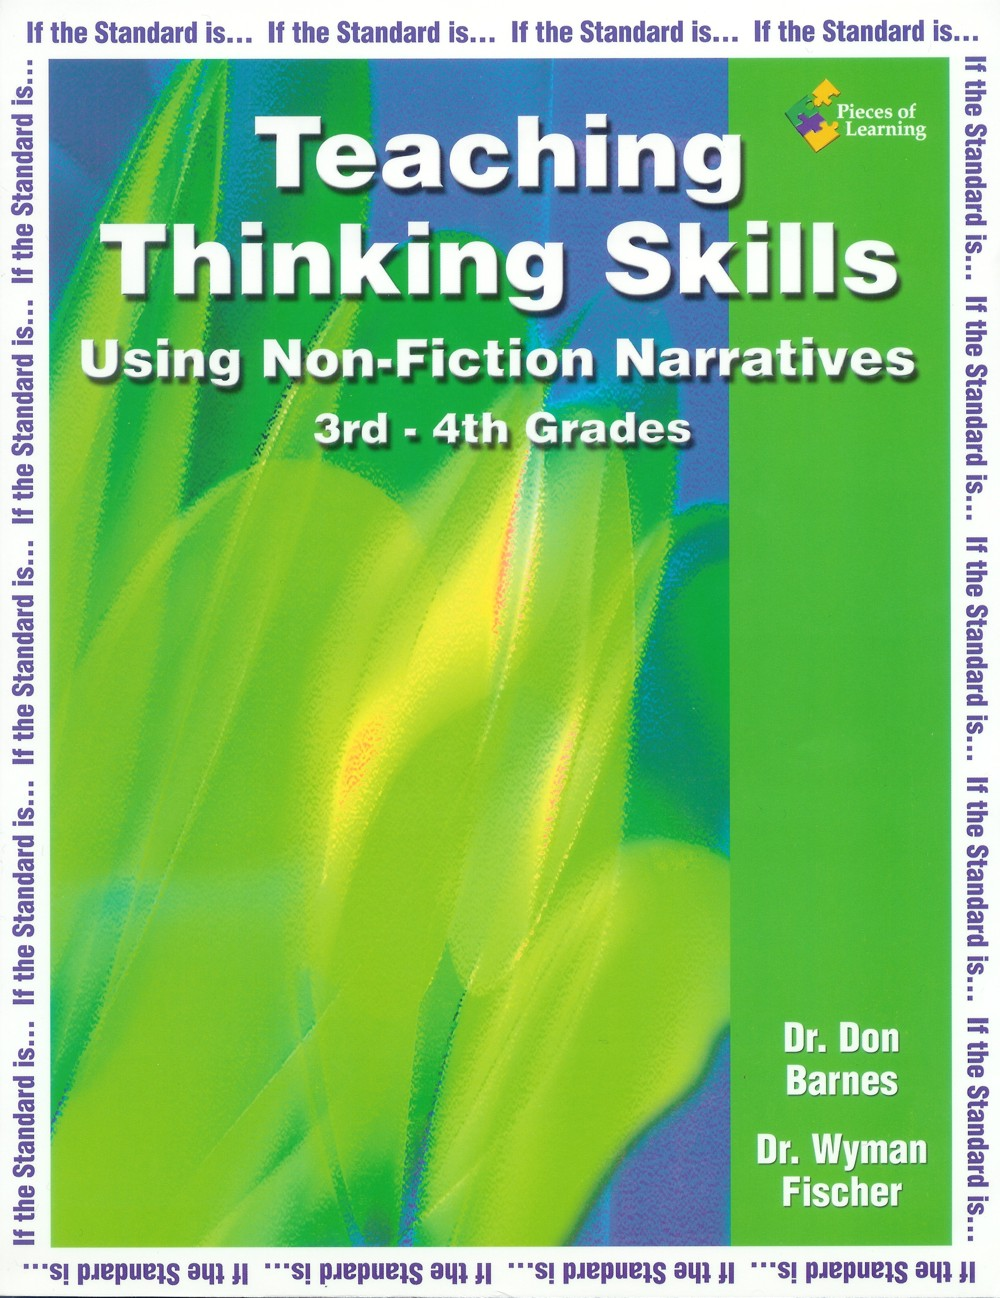 Go Green Book™ - Teaching Thinking Skills 3-4